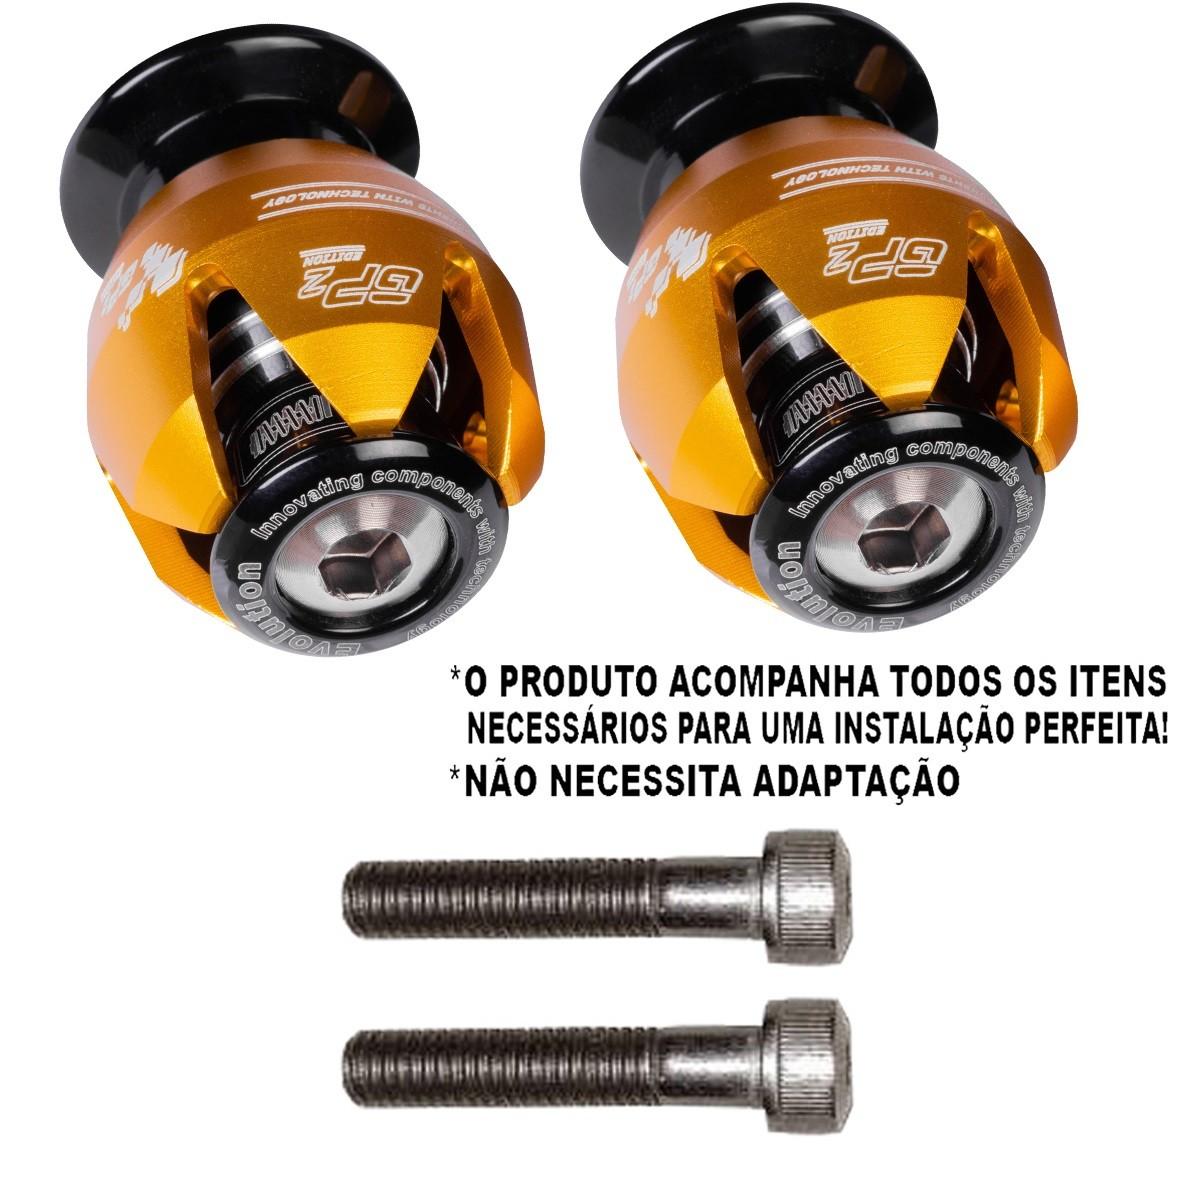 Slider traseiro ninja 650 2009 2010 2011 2012 2013 2014 2015 2016 balança kawasaki gp2 edition